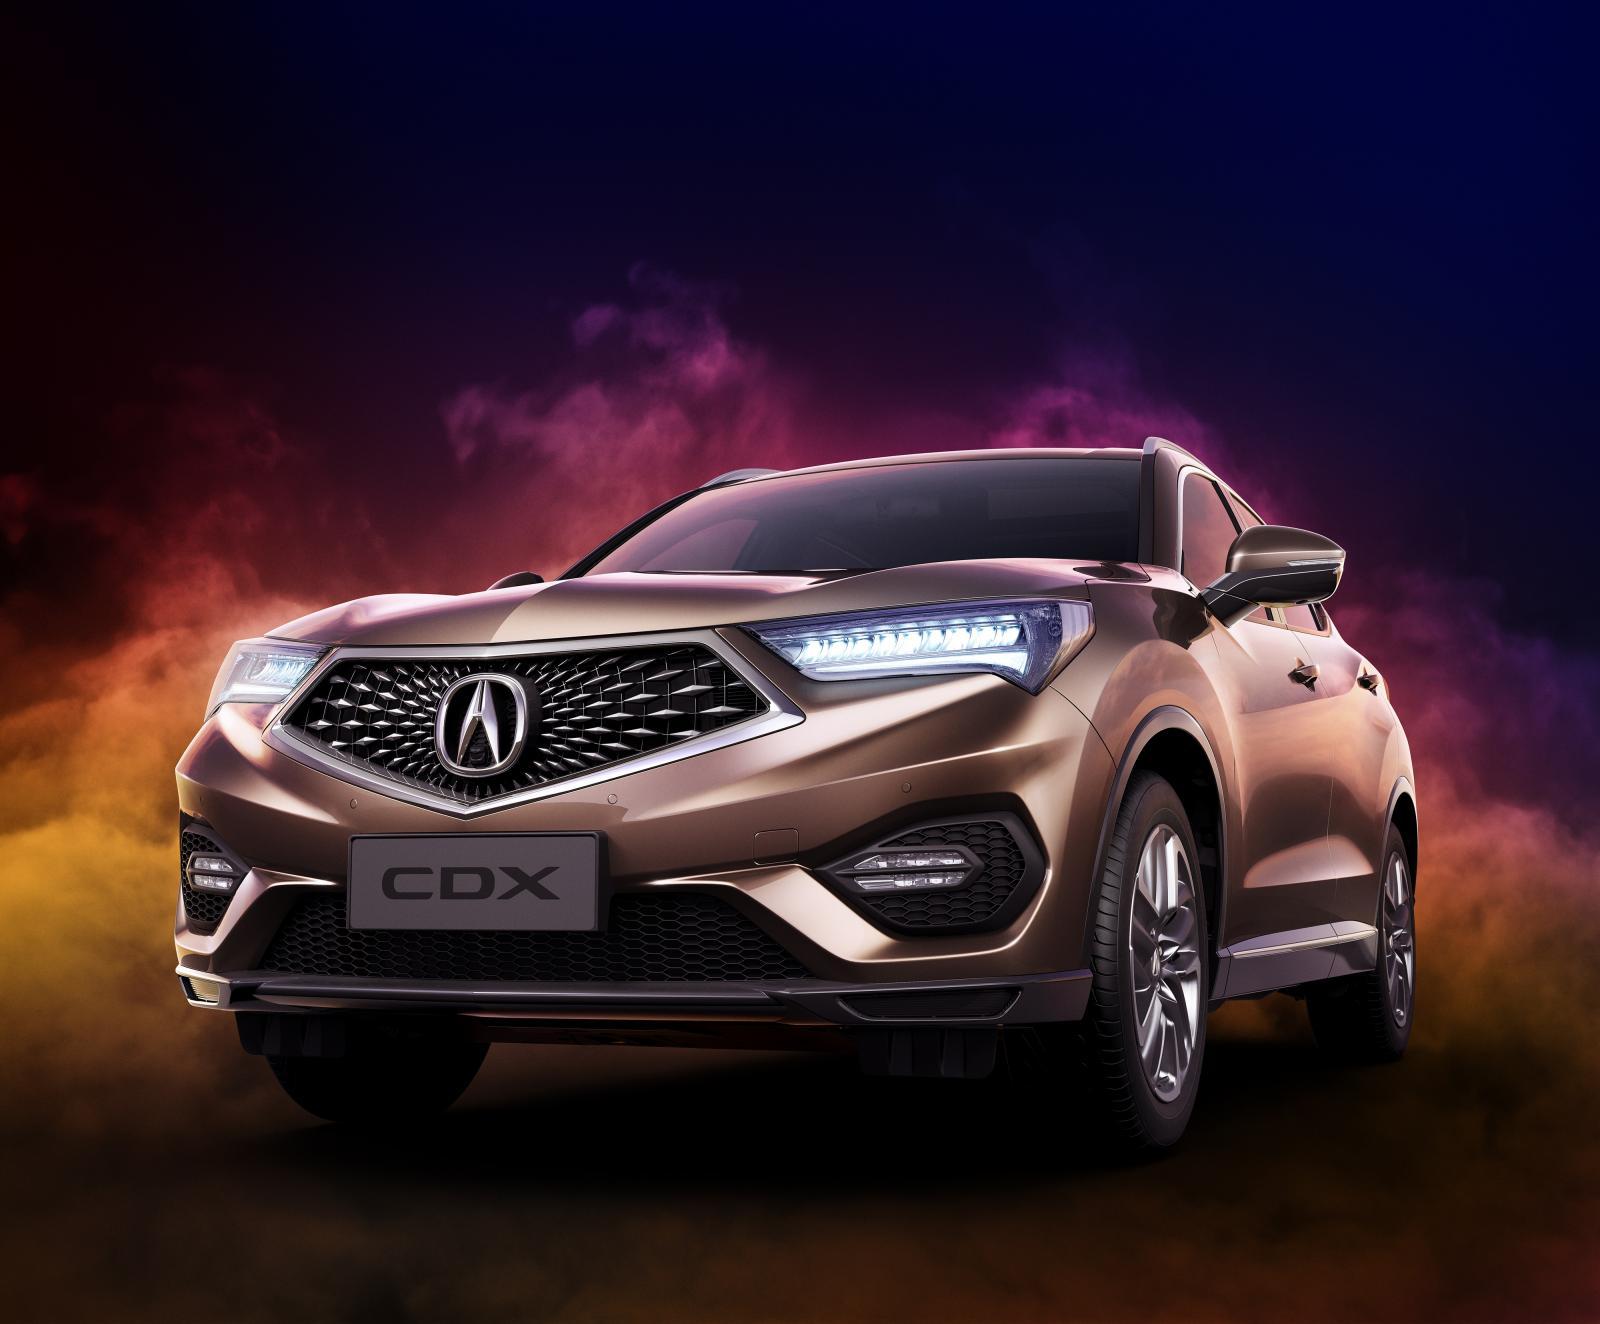 Image Result For Honda Premium Brand